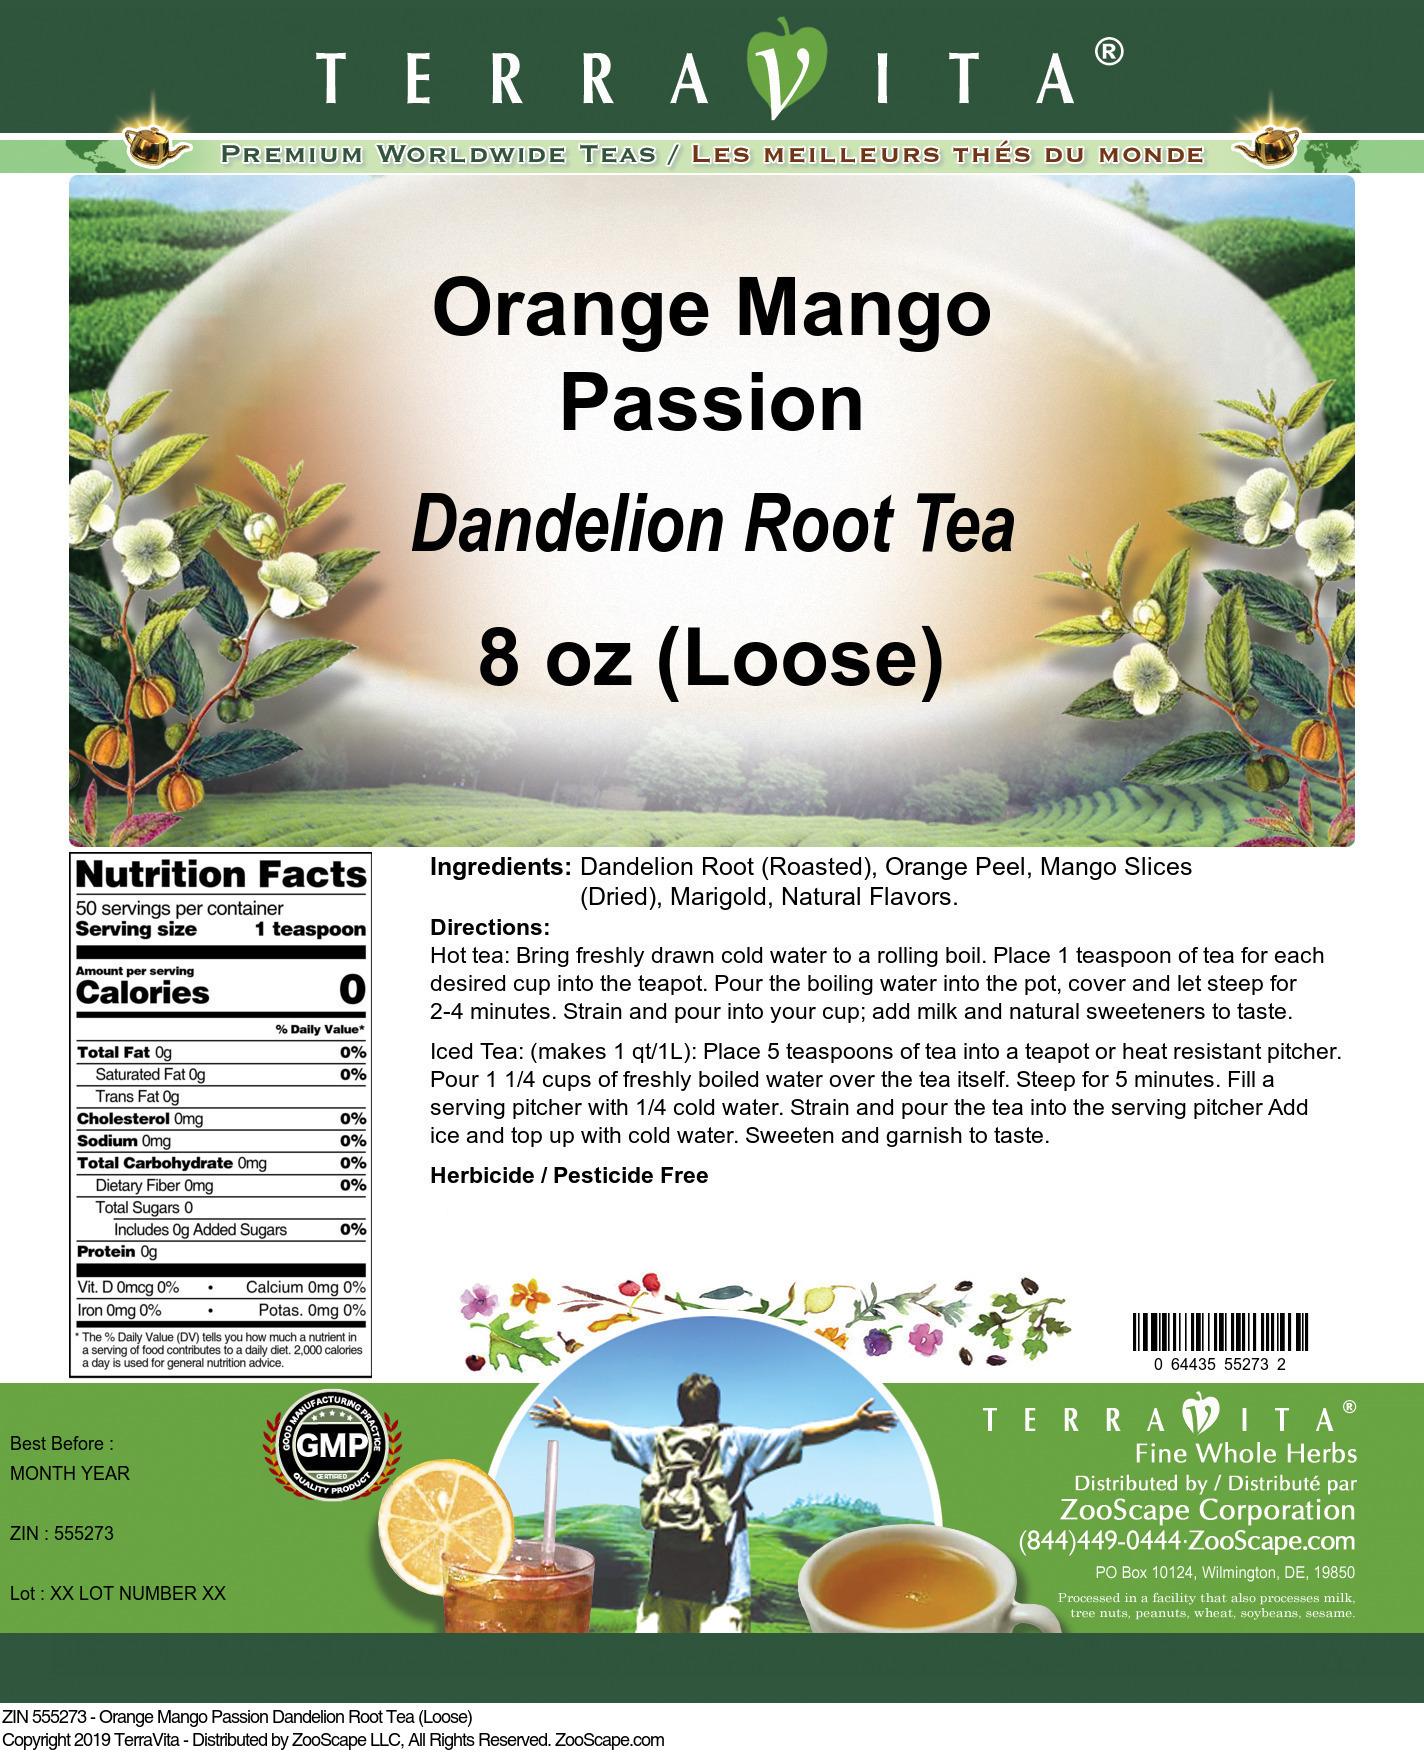 Orange Mango Passion Dandelion Root